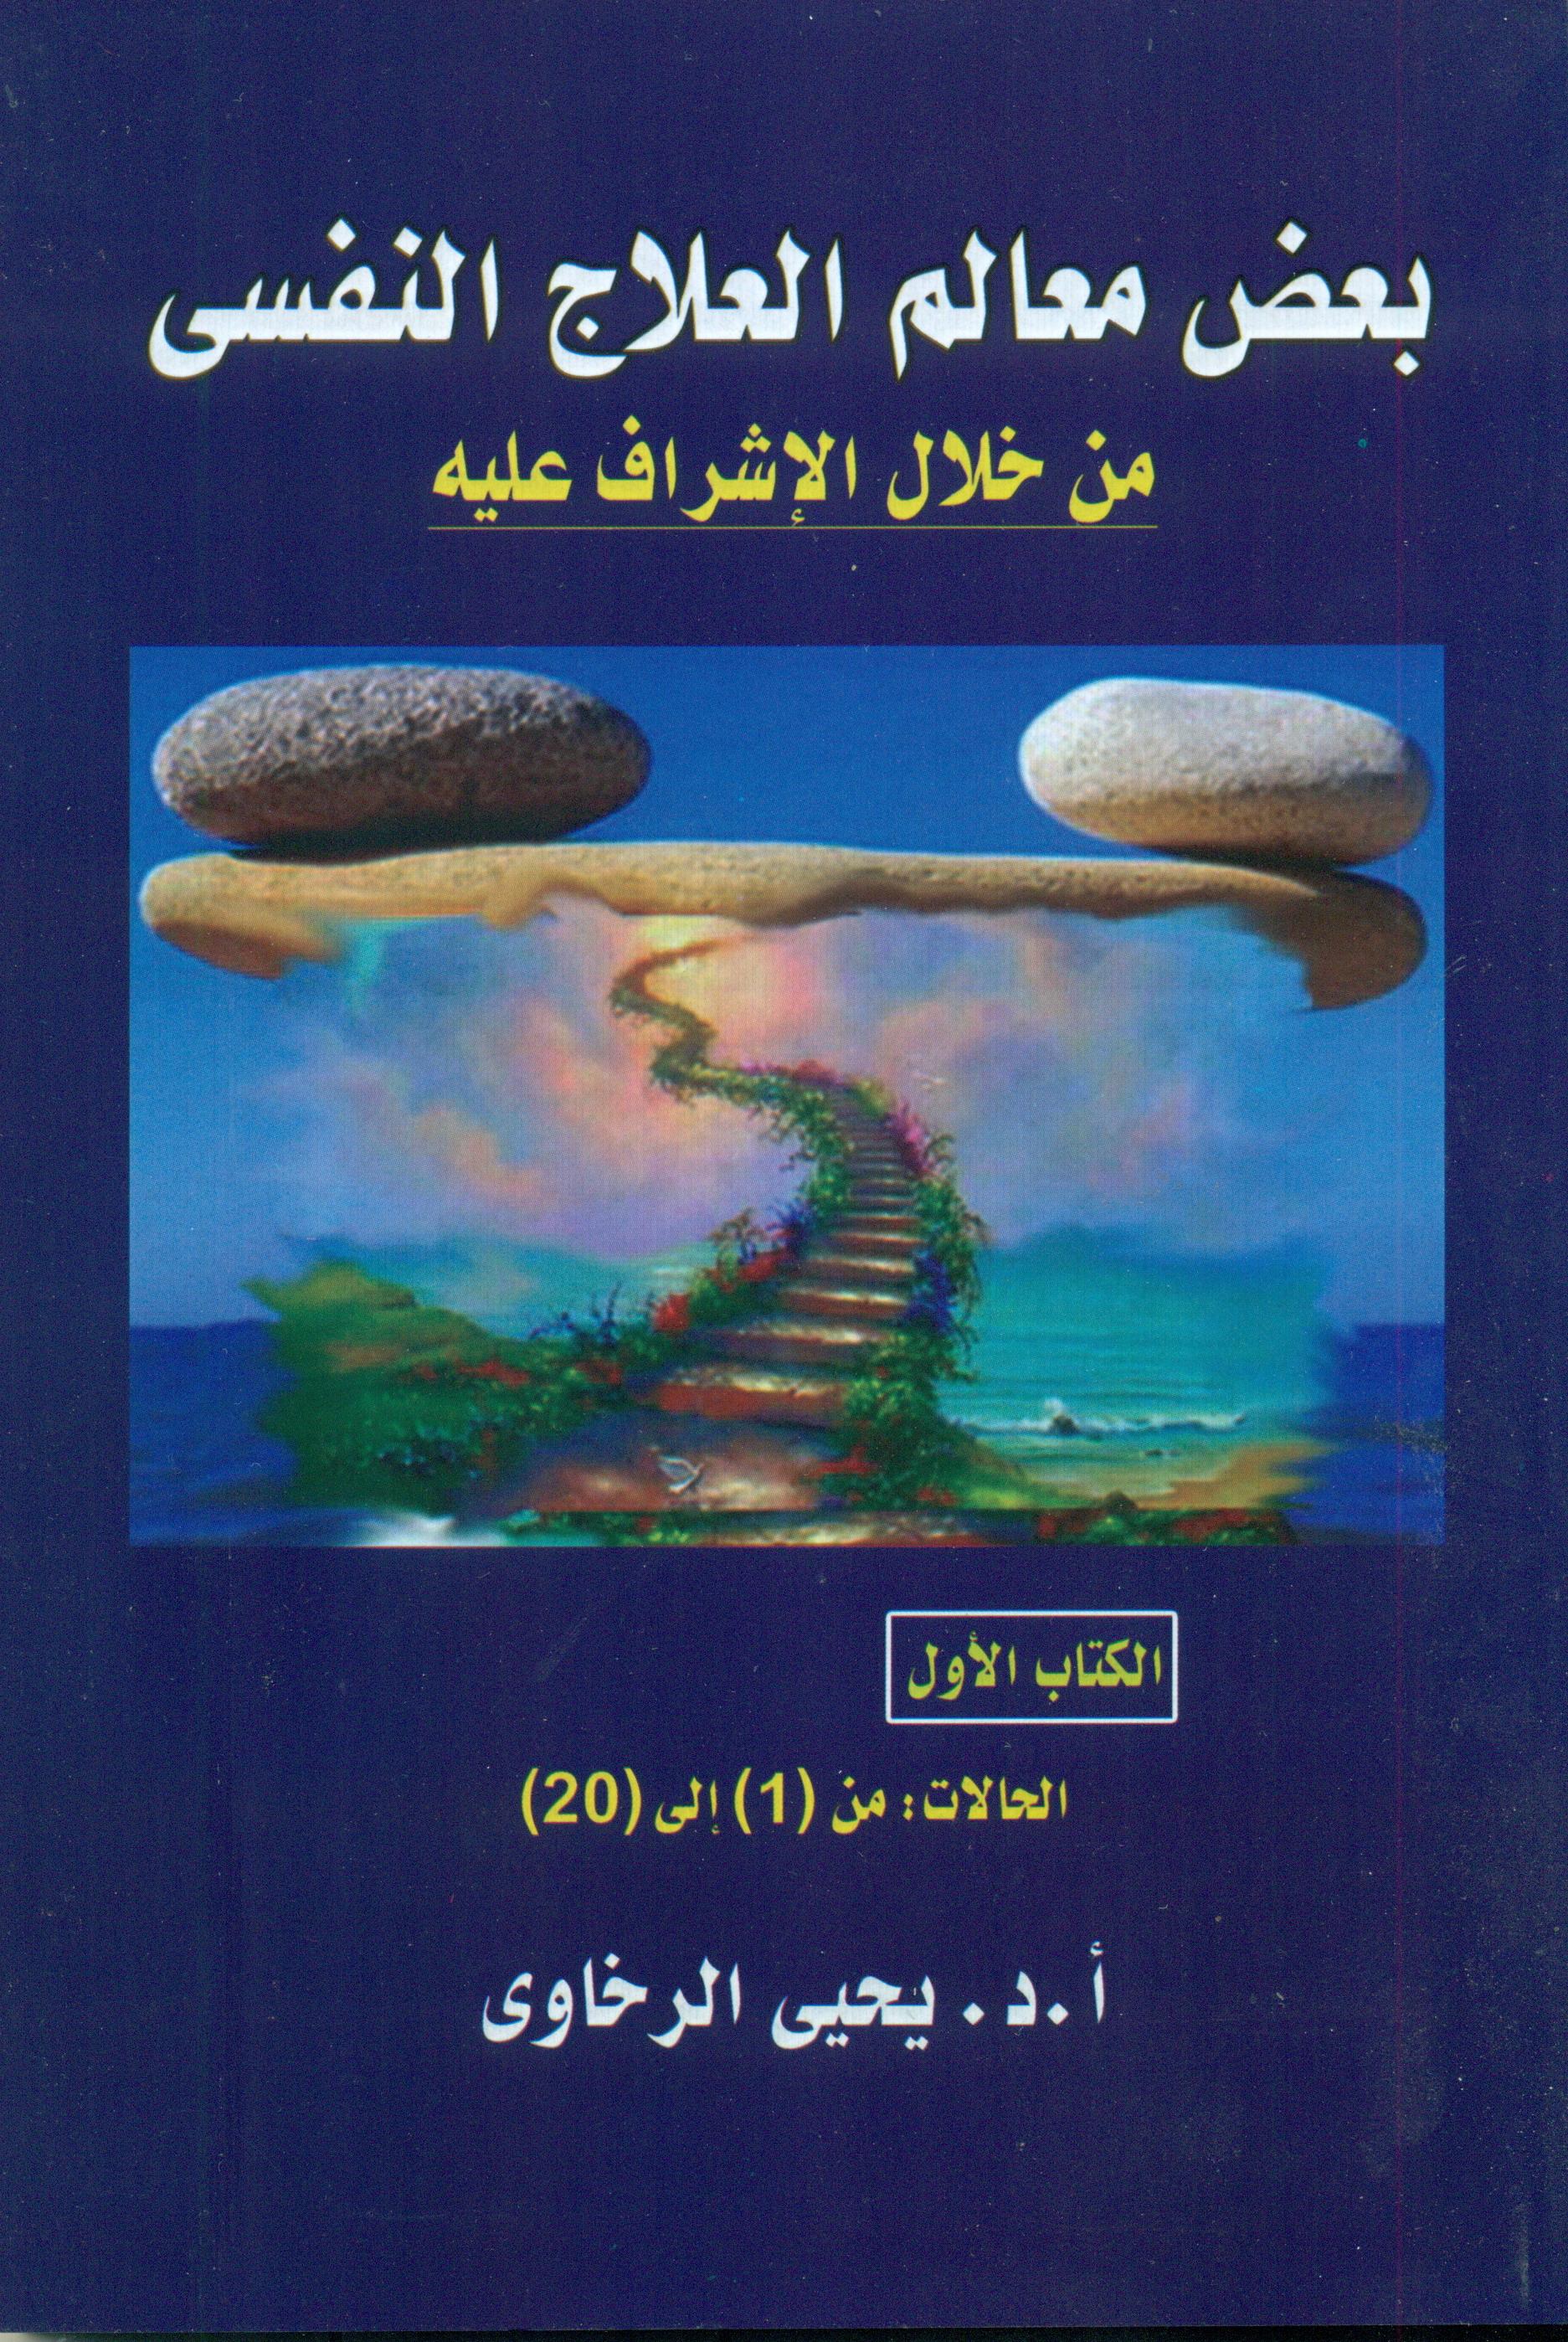 c9880bcd9 الكتاب الأول: بعض معالم العلاج النفسى من خلال الإشراف عليه : الحالات ...